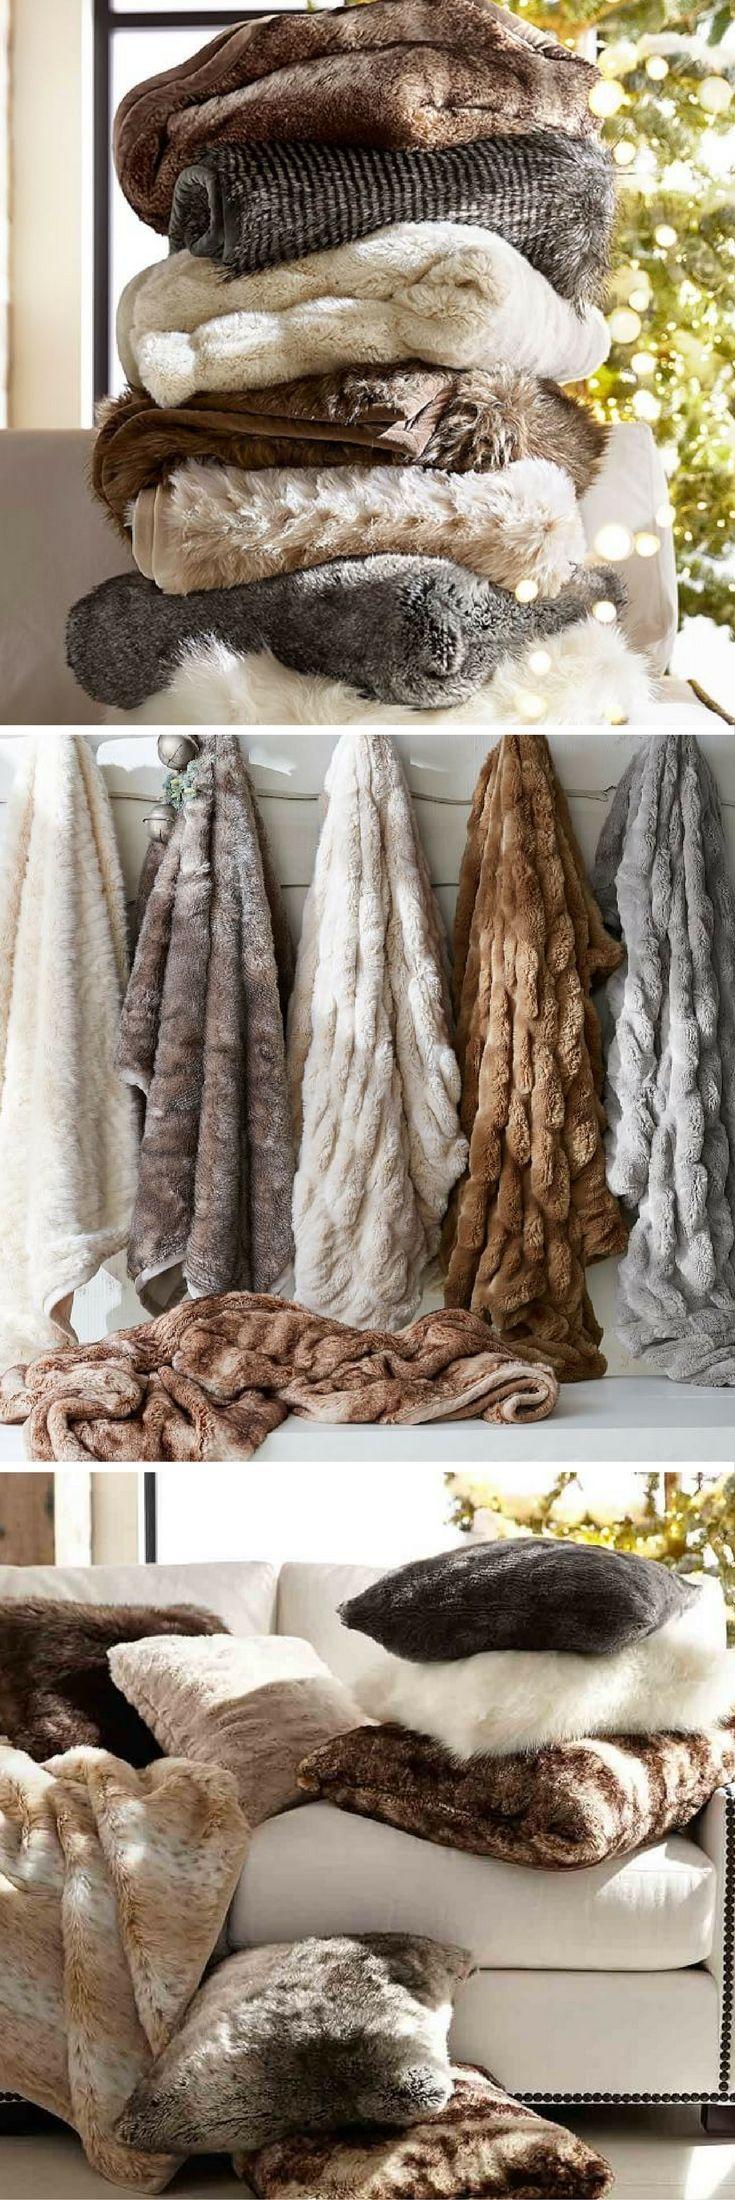 Faux Fur Throw Throw Blanket Warm Blanket Christmas Present Living Room Decor Bedroom Decor Home Acc Bedroom Decor Cozy Comfy Bedroom Warm Blankets #throw #blankets #for #living #room